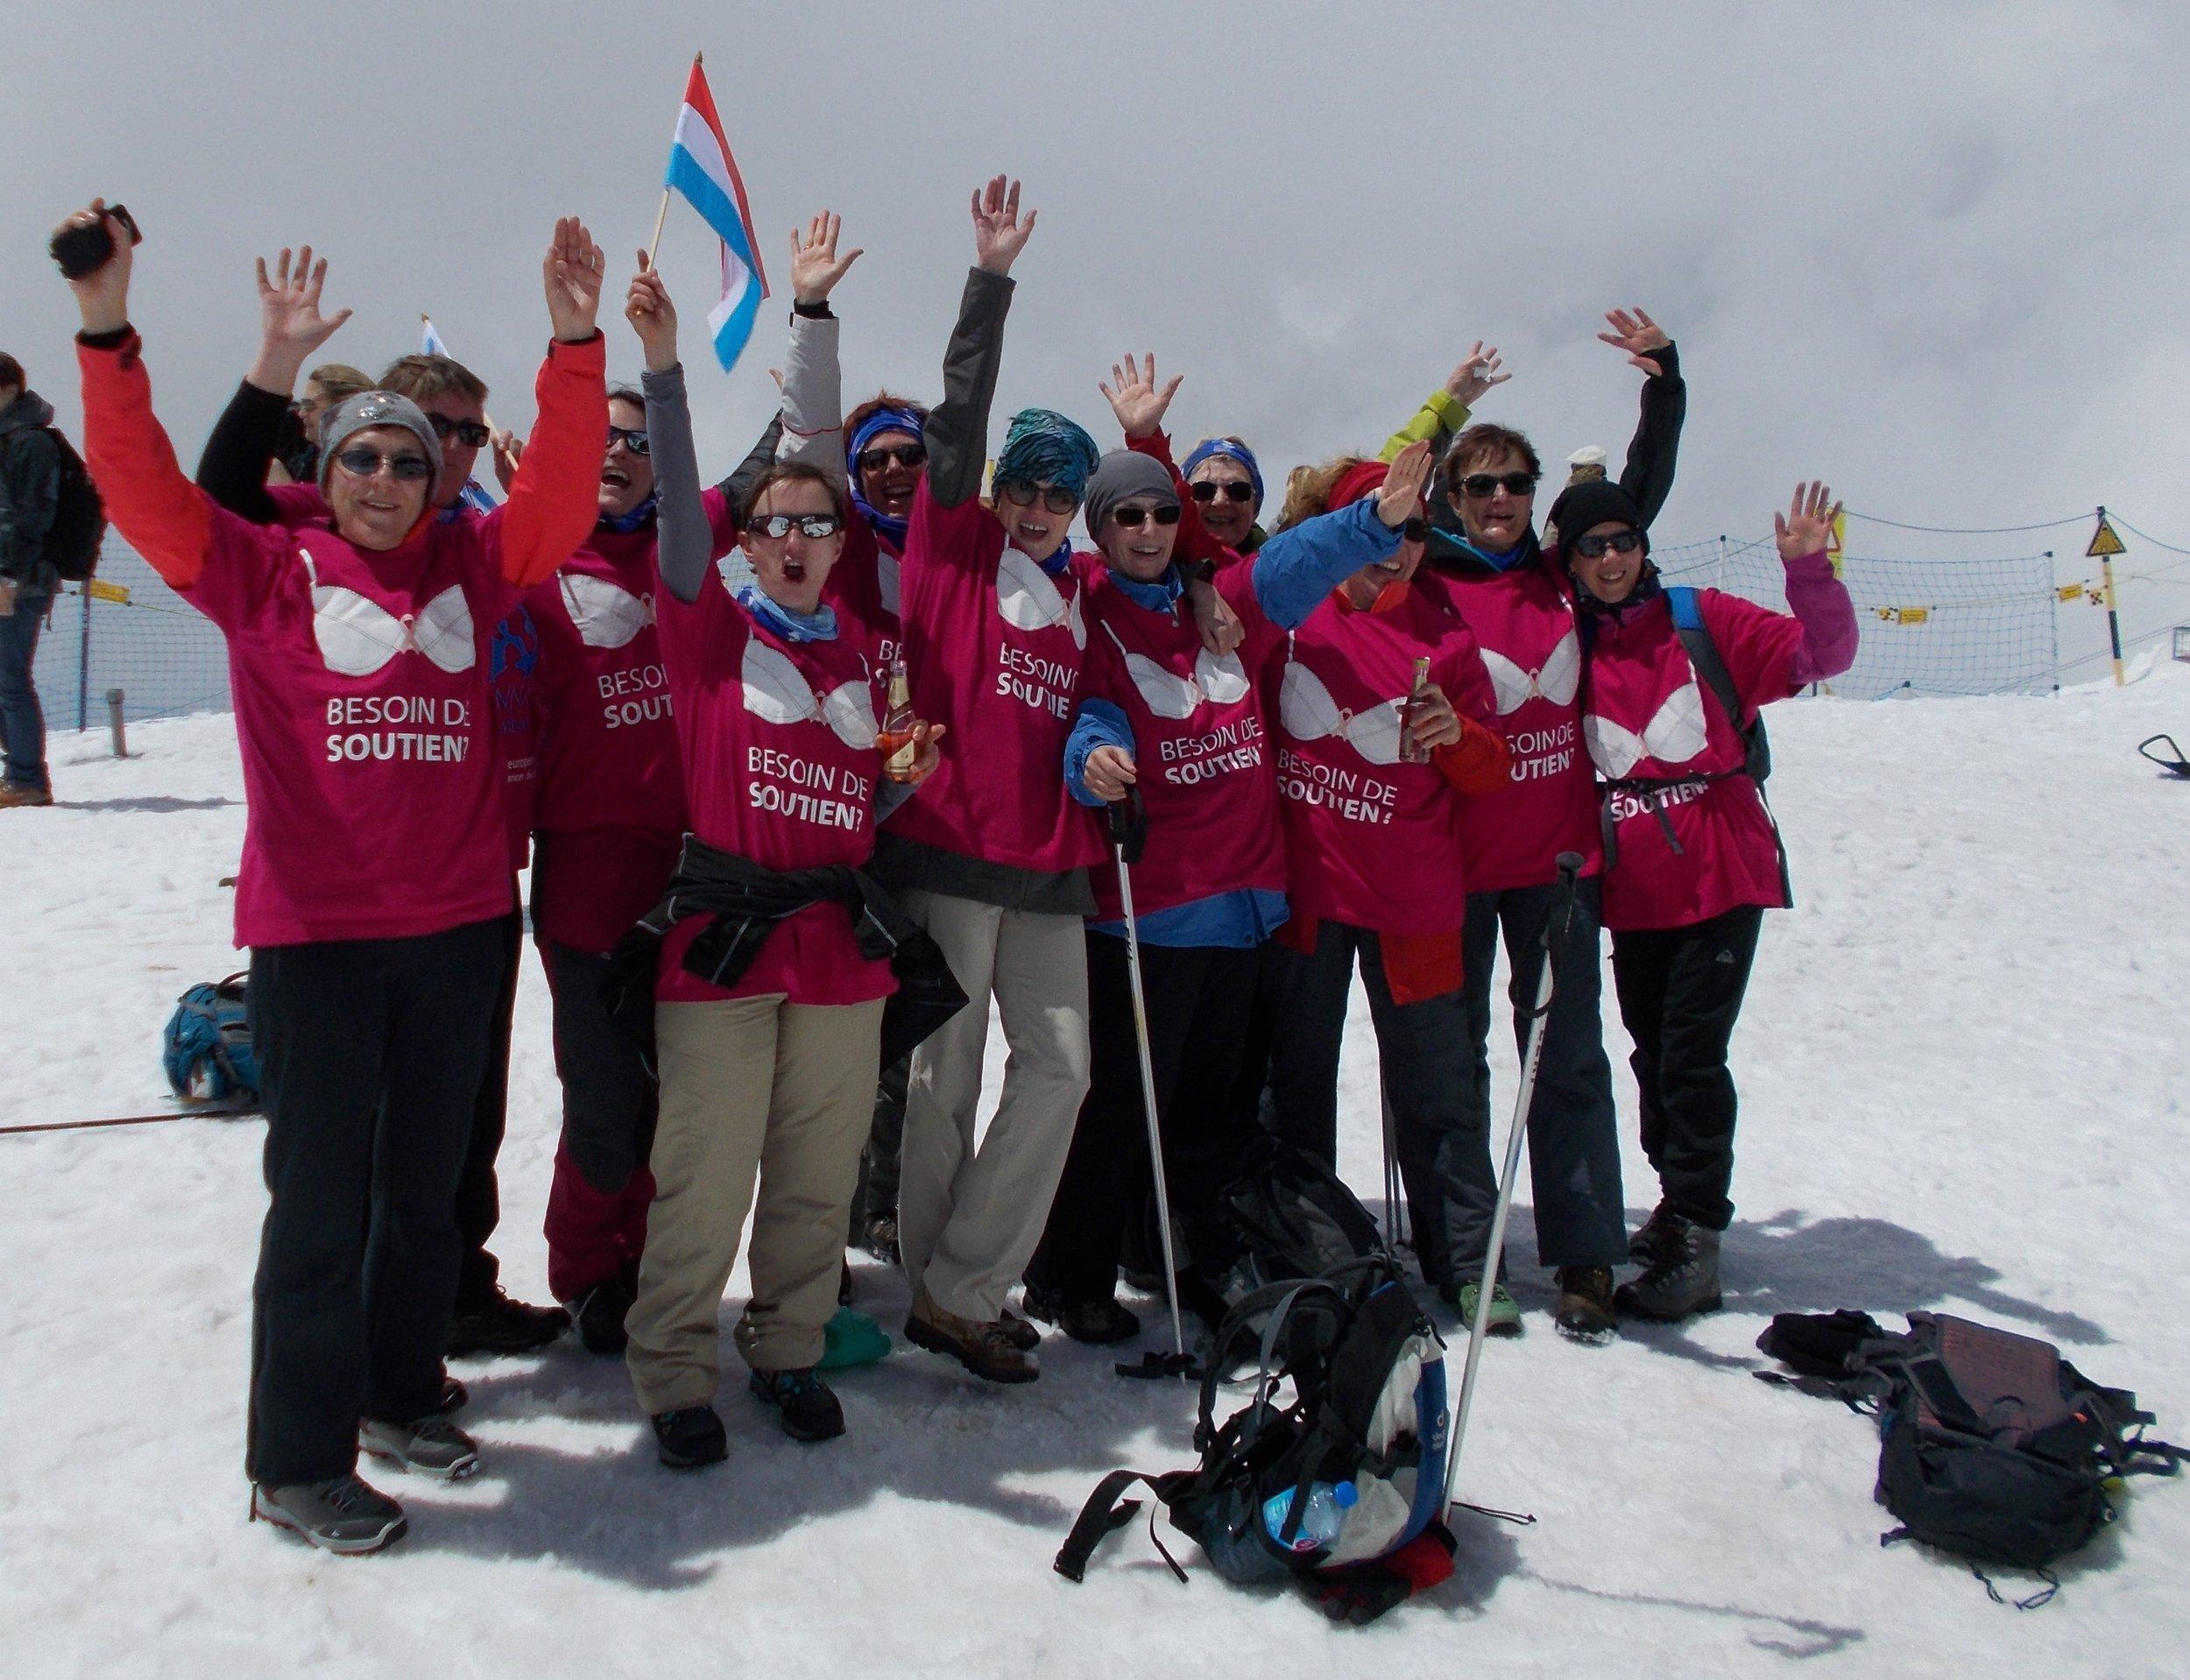 2016-06 EDL - Rope of Solidarity Breithorn reduced size fir OctobreRose CHL_15.JPG